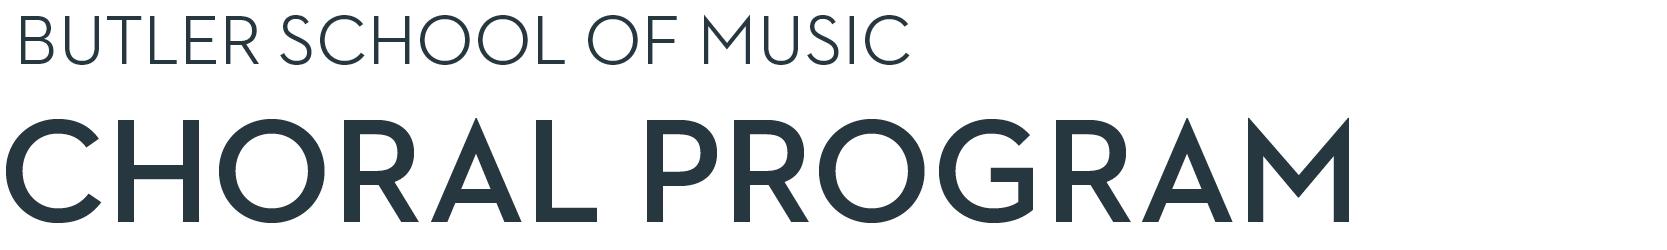 Butler School of Music Choral Program